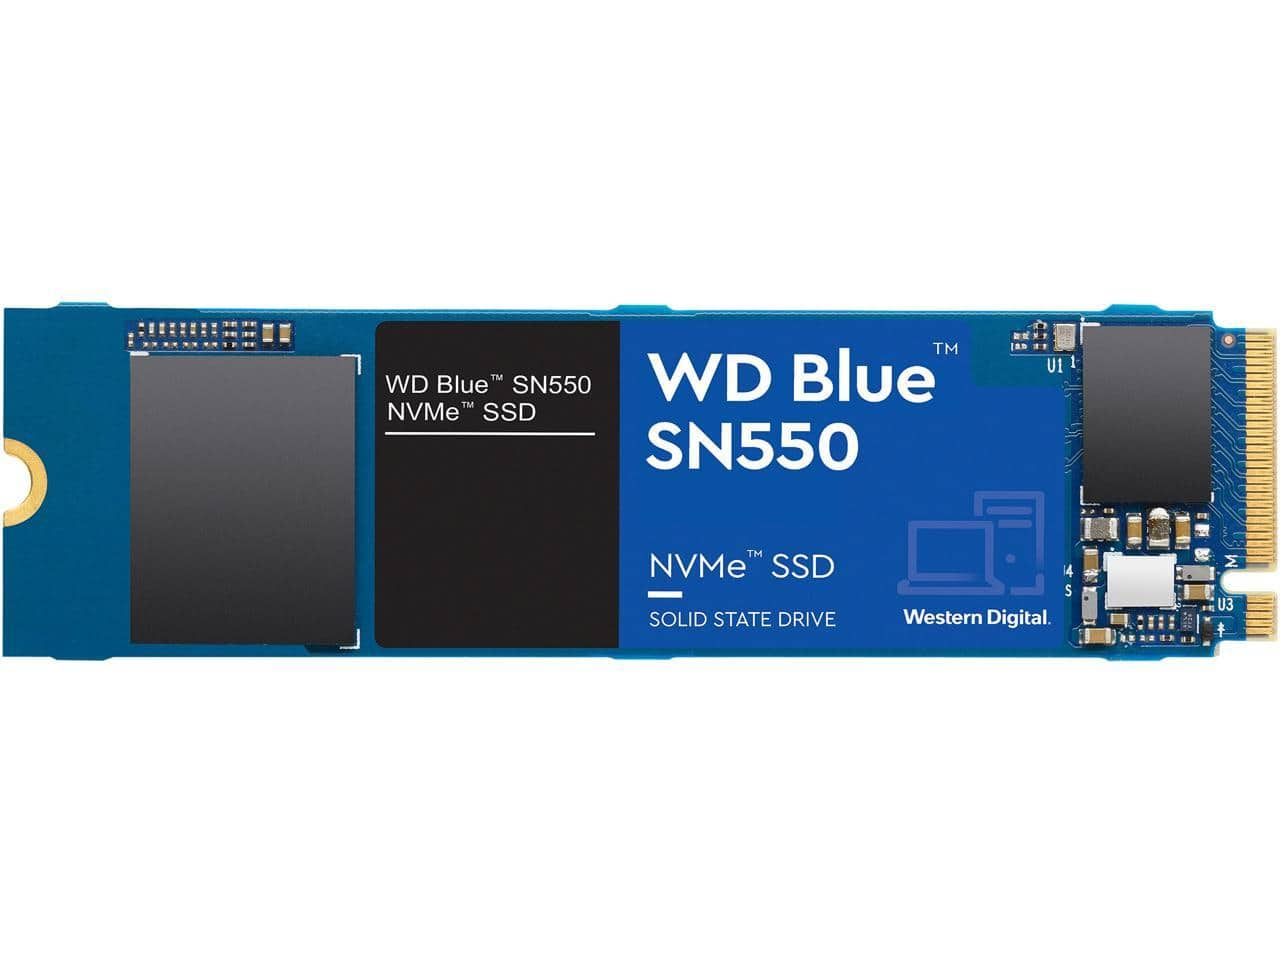 500GB WD Blue SN550 NVMe SSD @Newegg $50